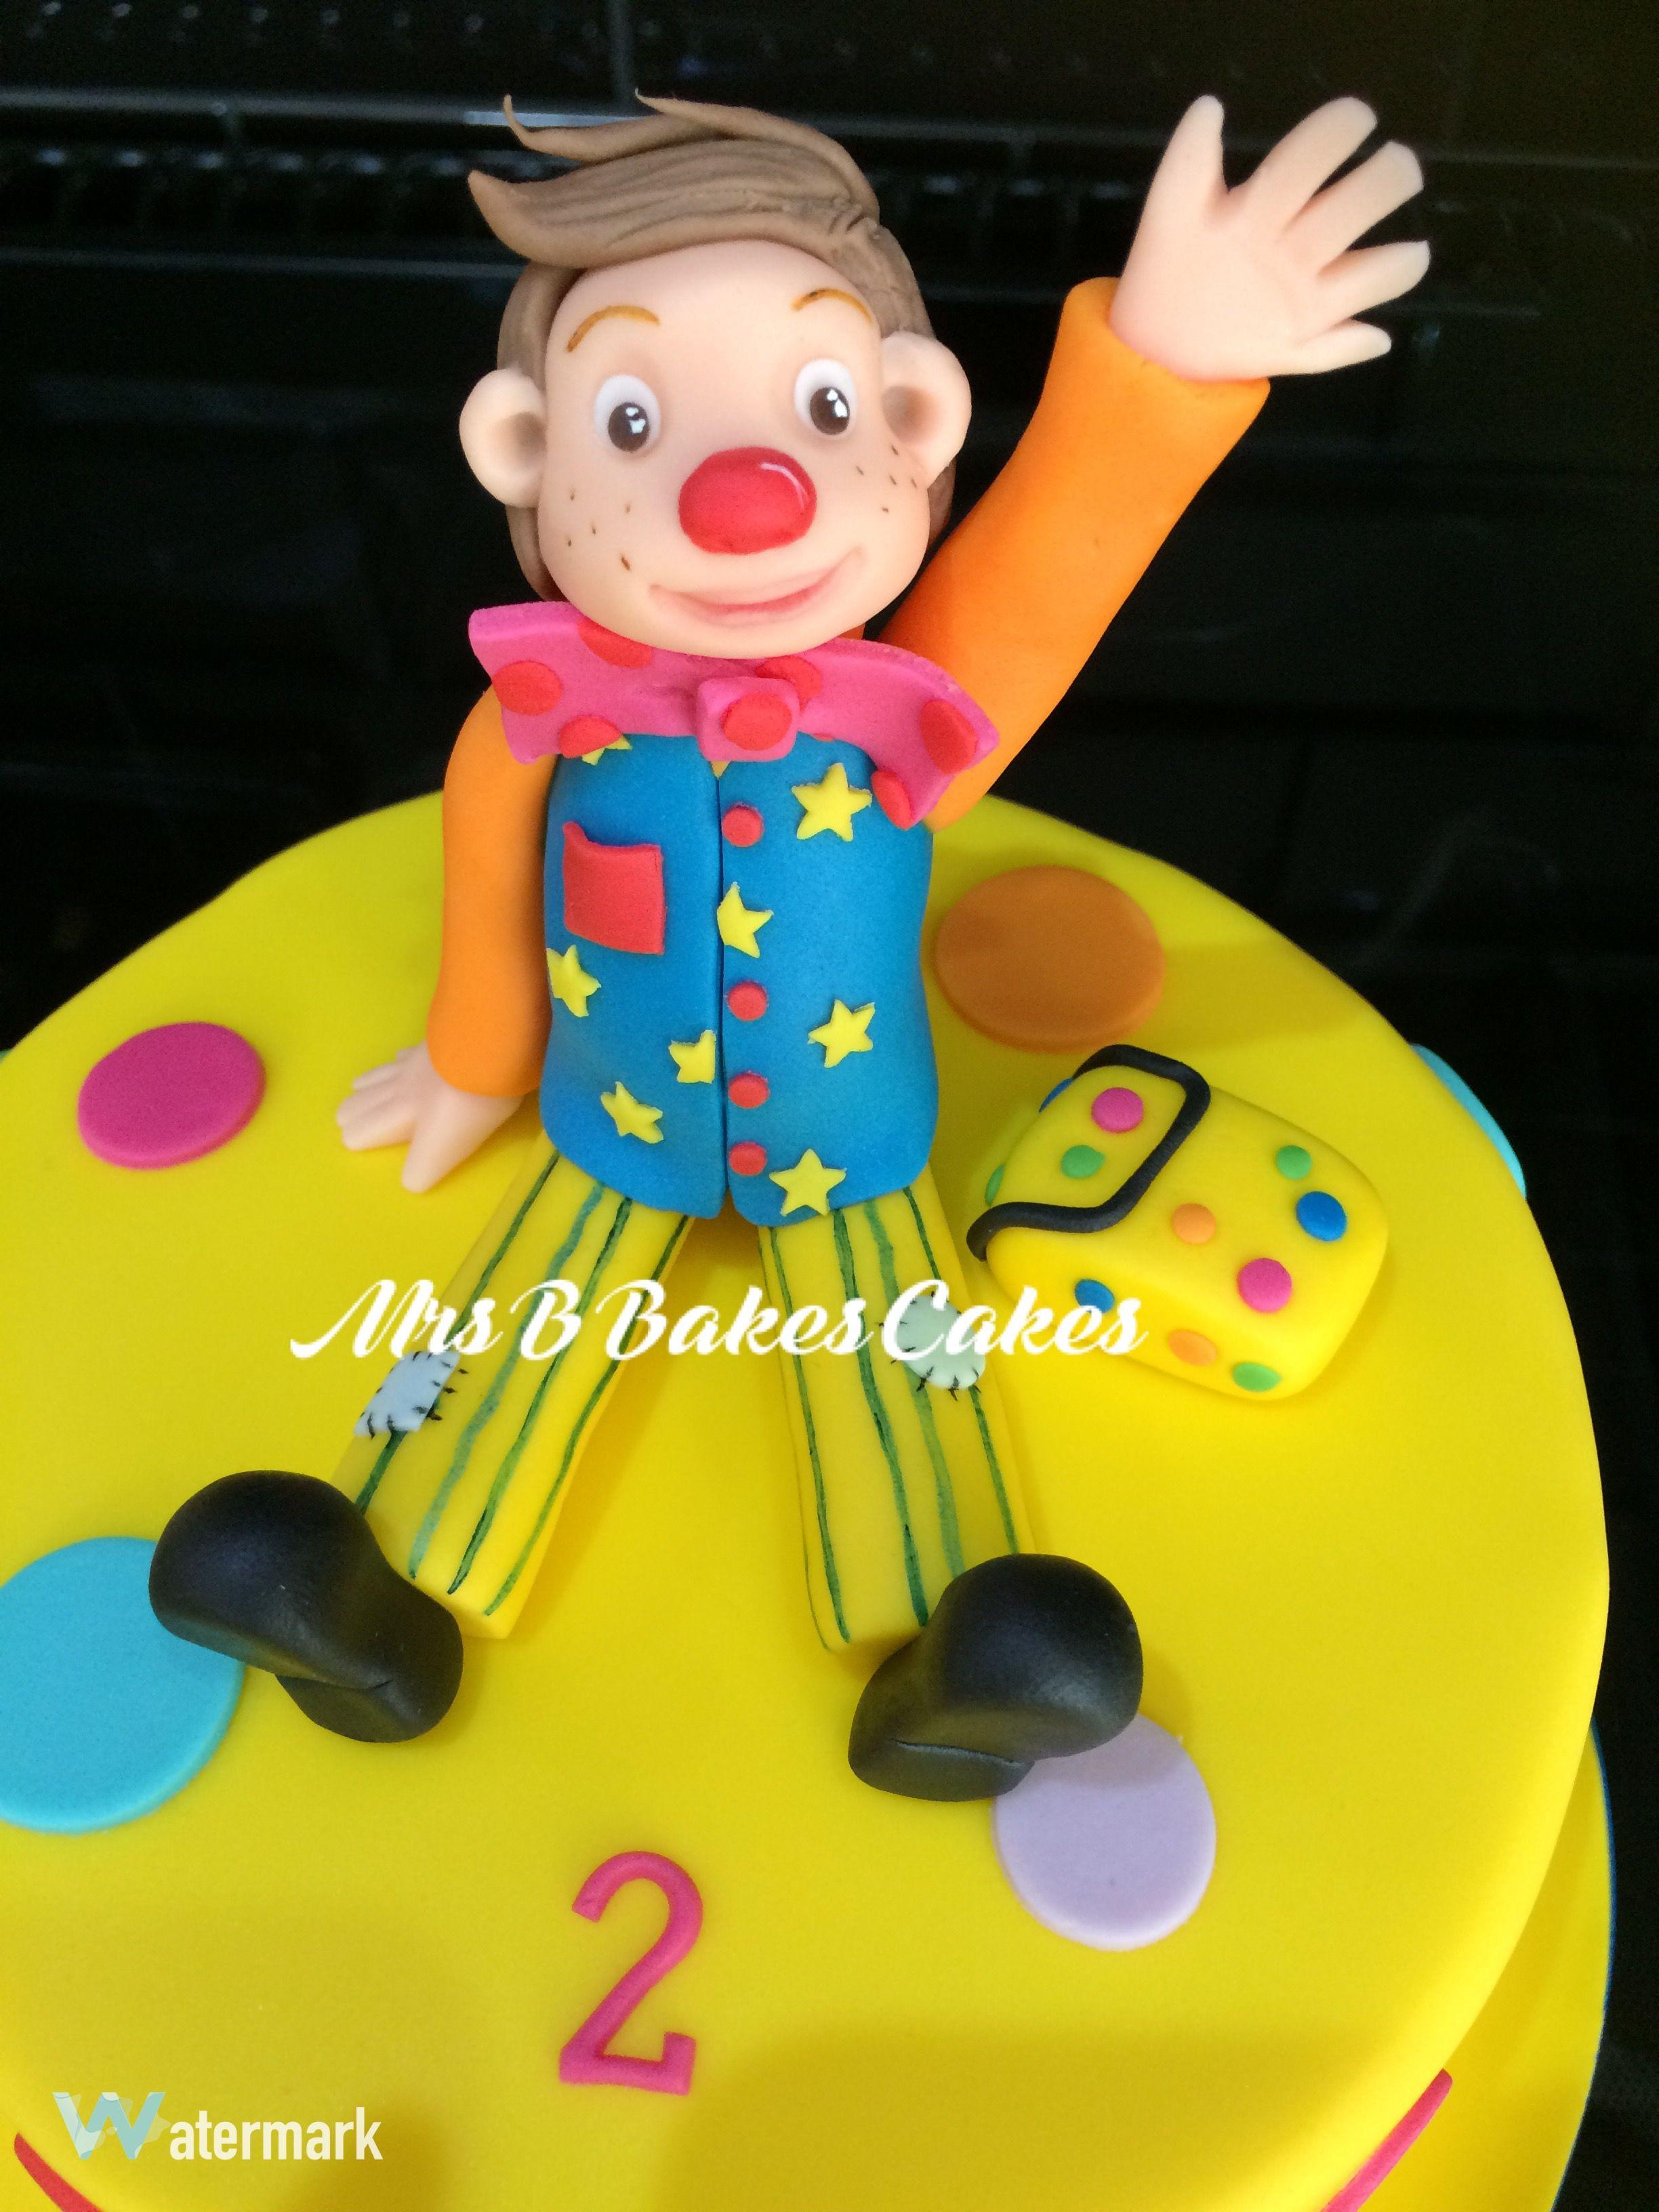 Pin By Aimee Pirouet On Baby Cake Ideas Cake Clown Cake